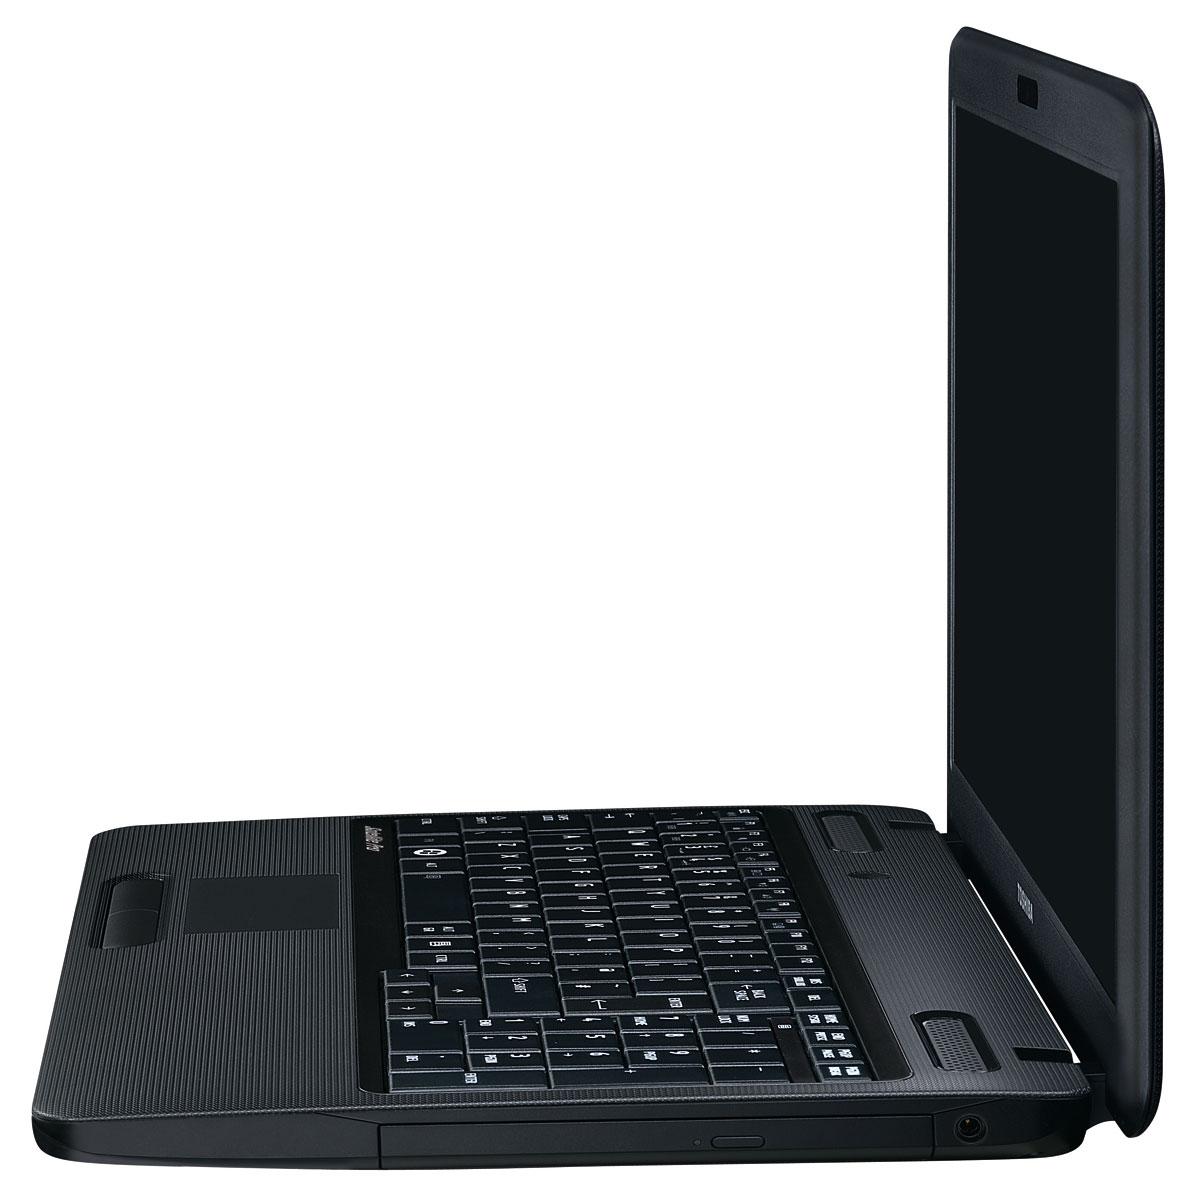 toshiba satellite pro c660 2c0 pc portable toshiba sur. Black Bedroom Furniture Sets. Home Design Ideas